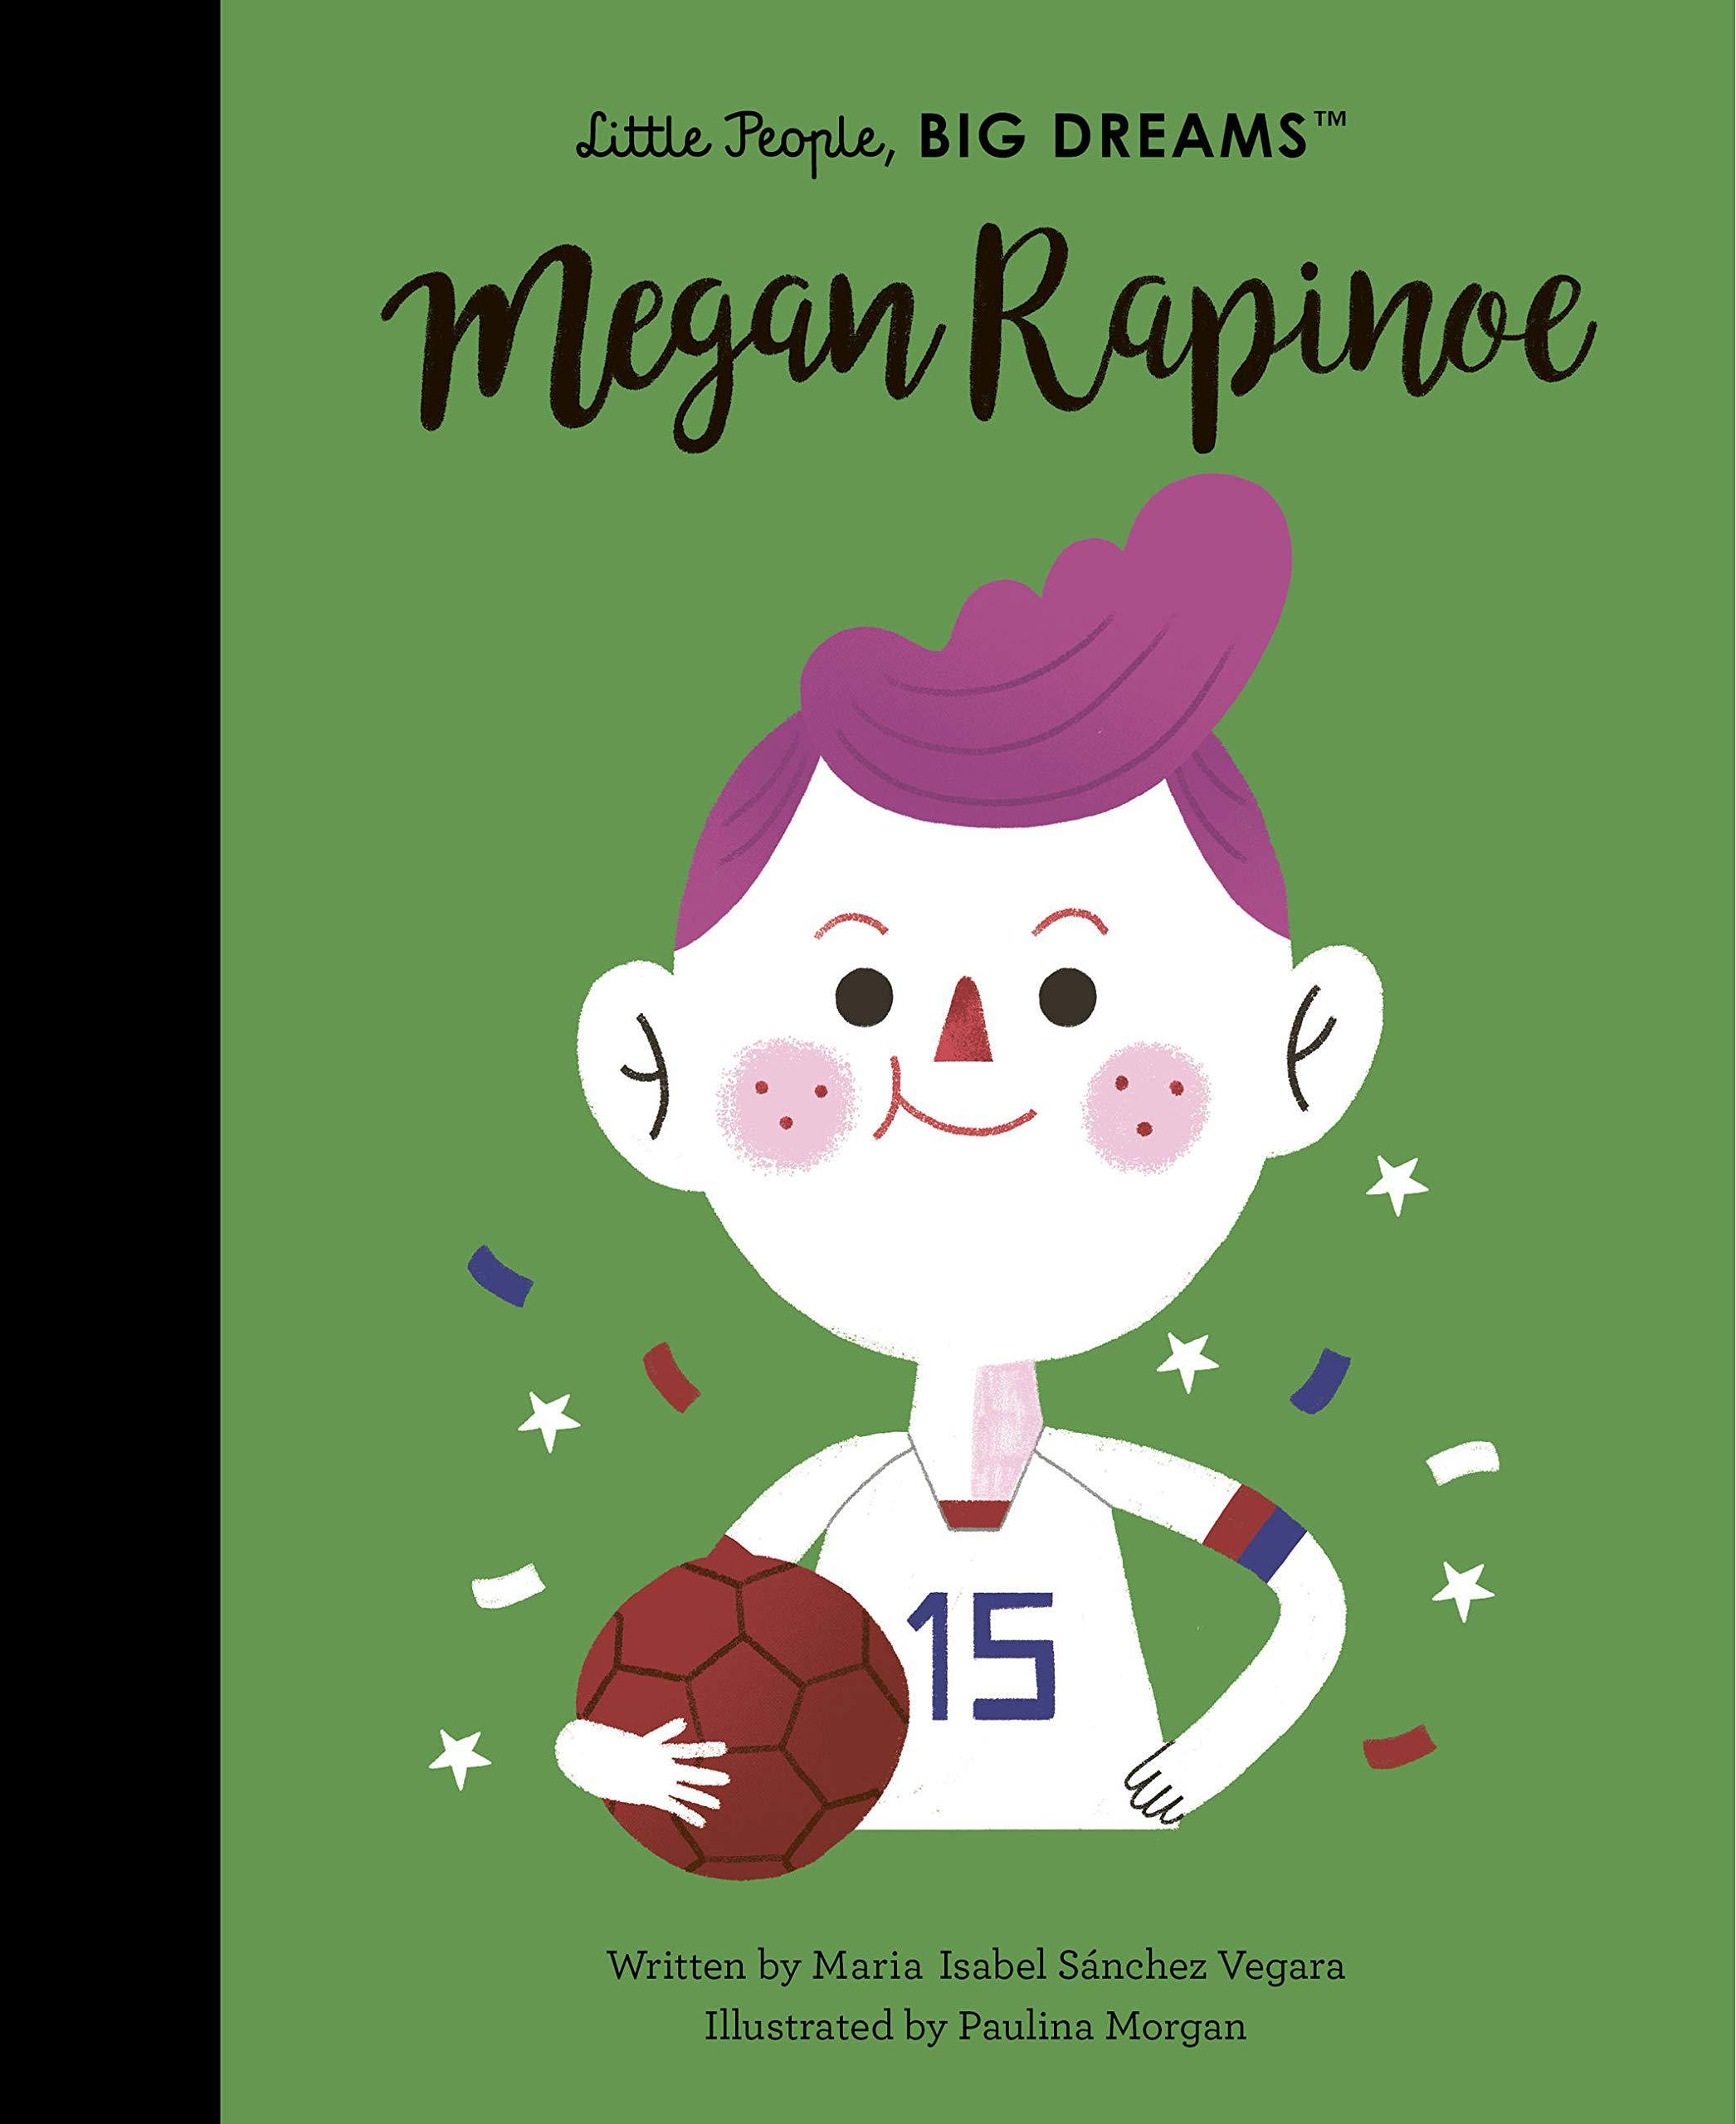 celebrate-picture-books-picture-book-review-megan-rapinoe-cover-2